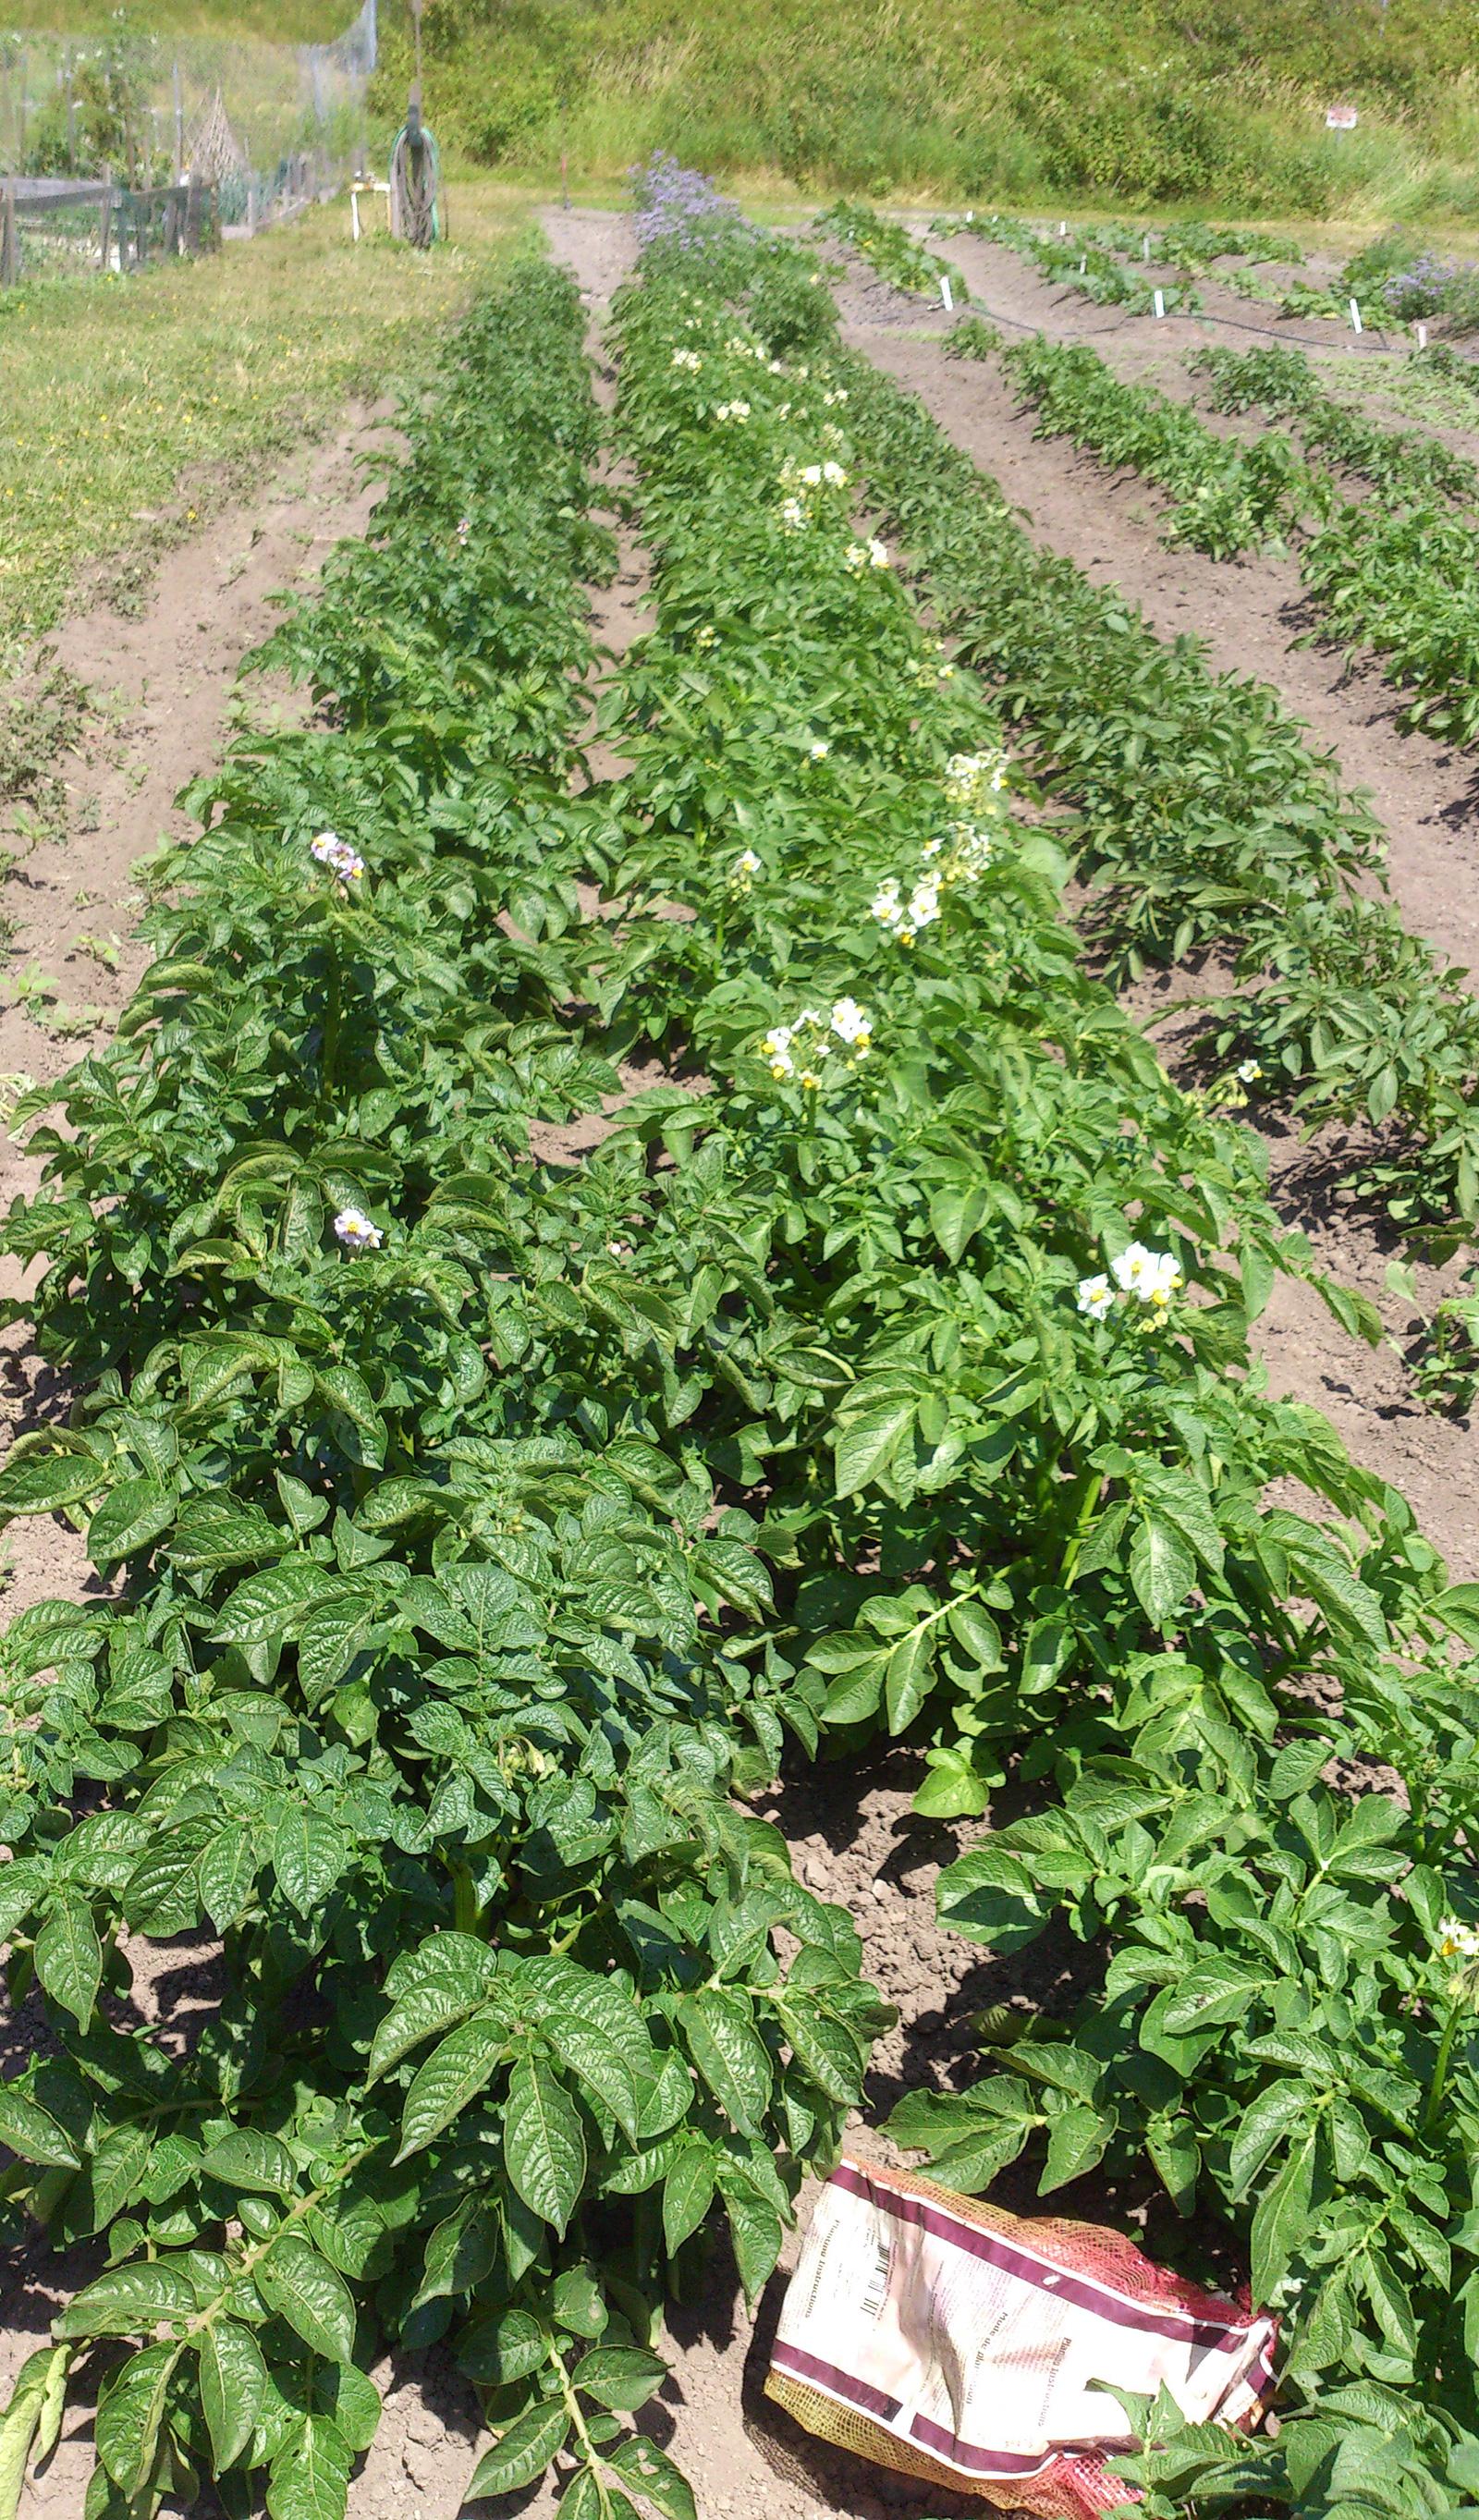 Potato Patch in June